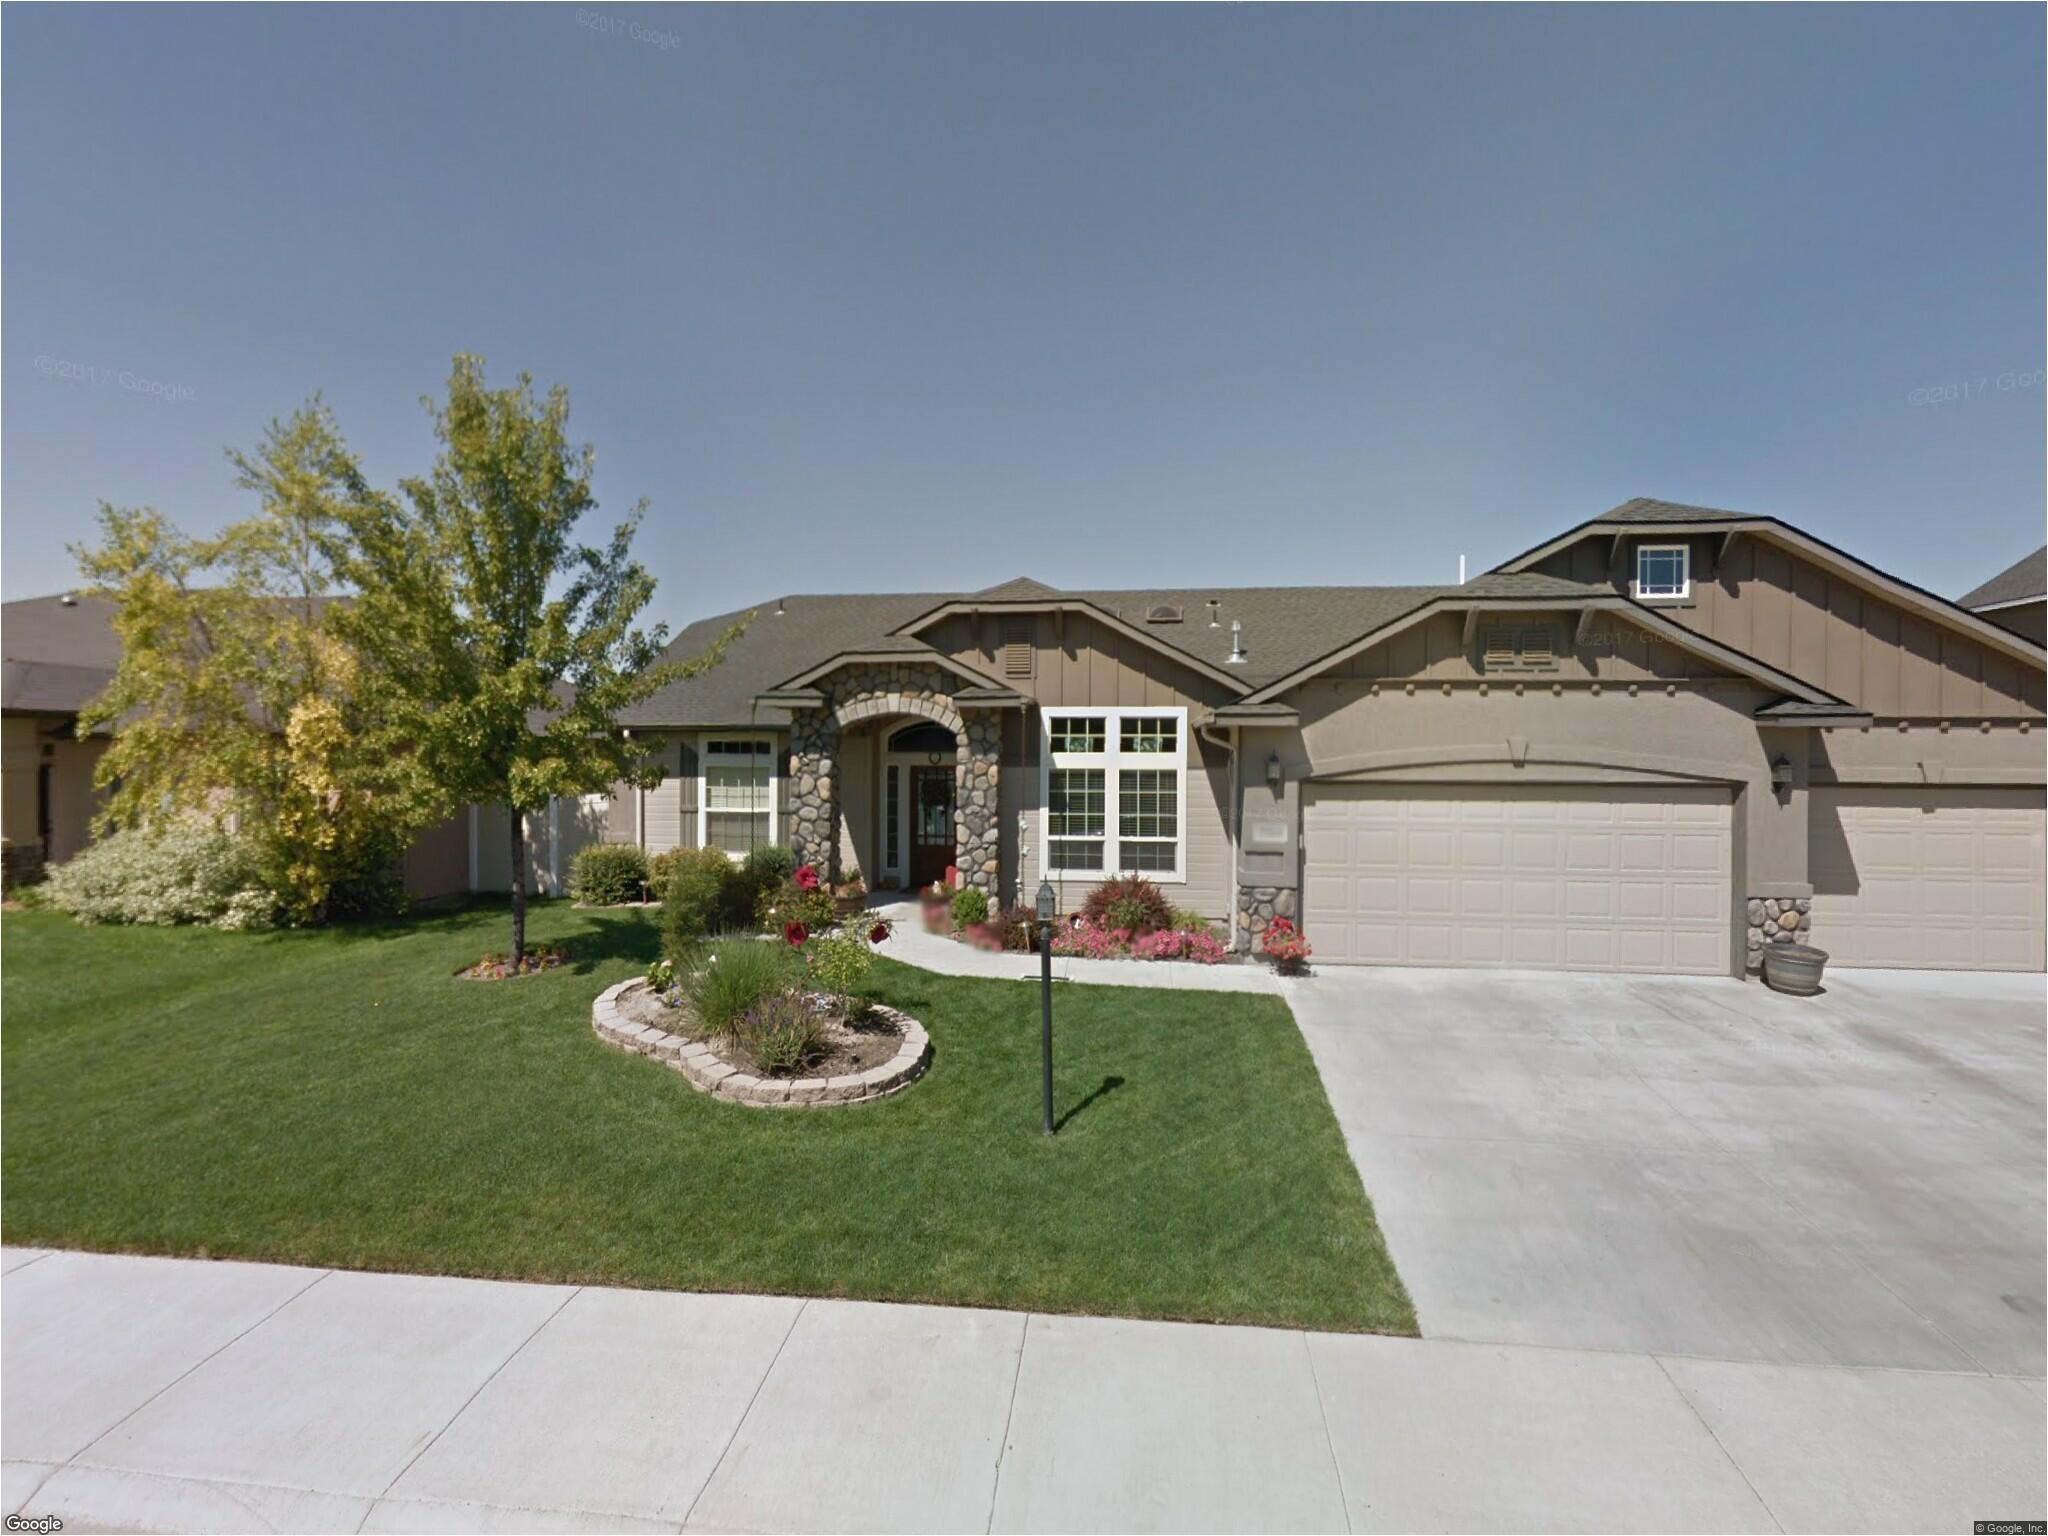 Homes for Rent In Boise Idaho 2164 W Kelly Creek Dr Meridian Id 83646 Trulia